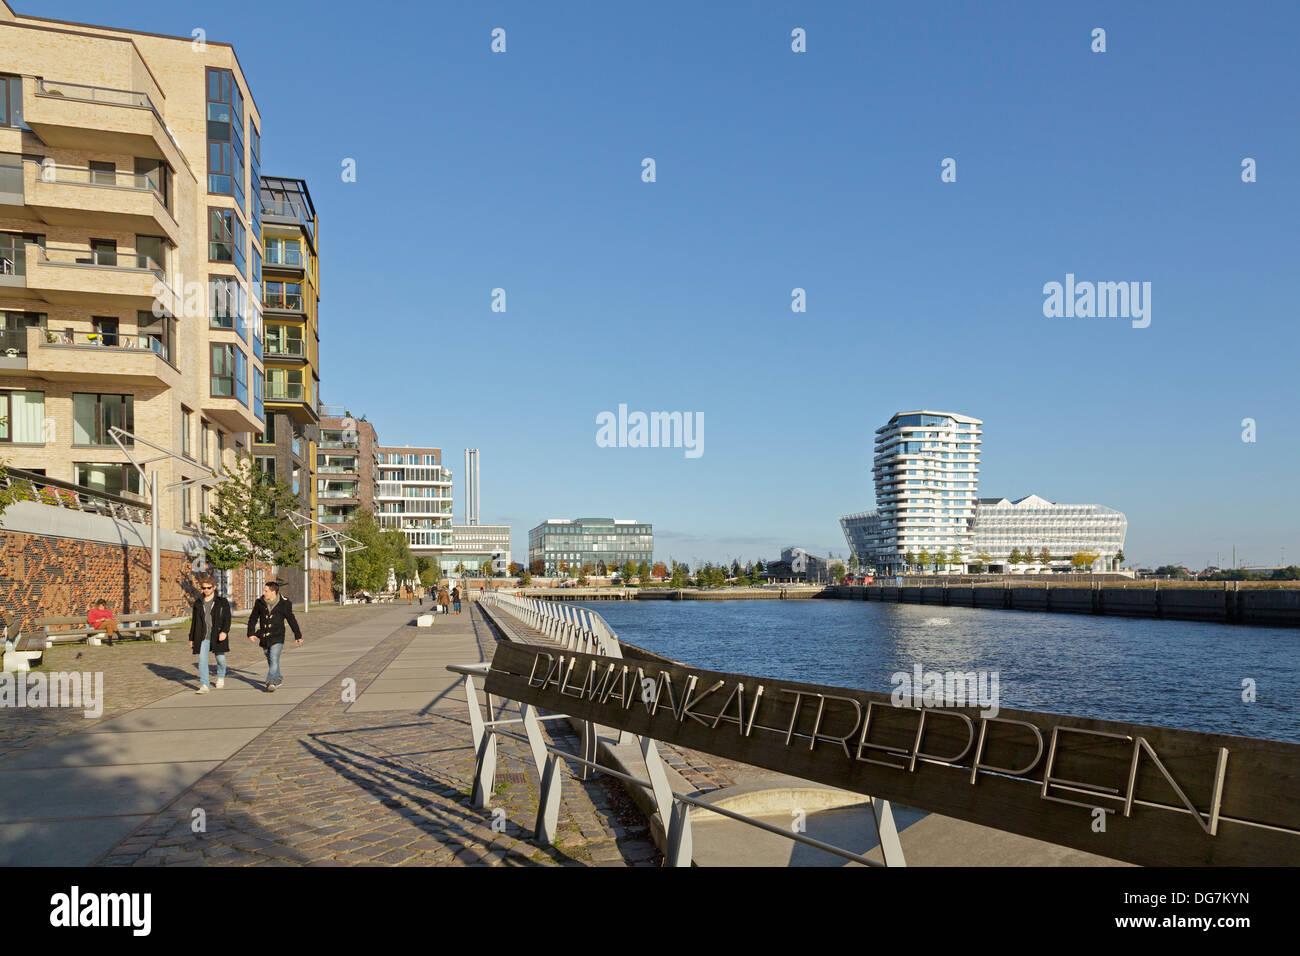 Dalmannkai, Marco-Polo-Tower and Unilever House, Harbor City Hamburg, Germany - Stock Image